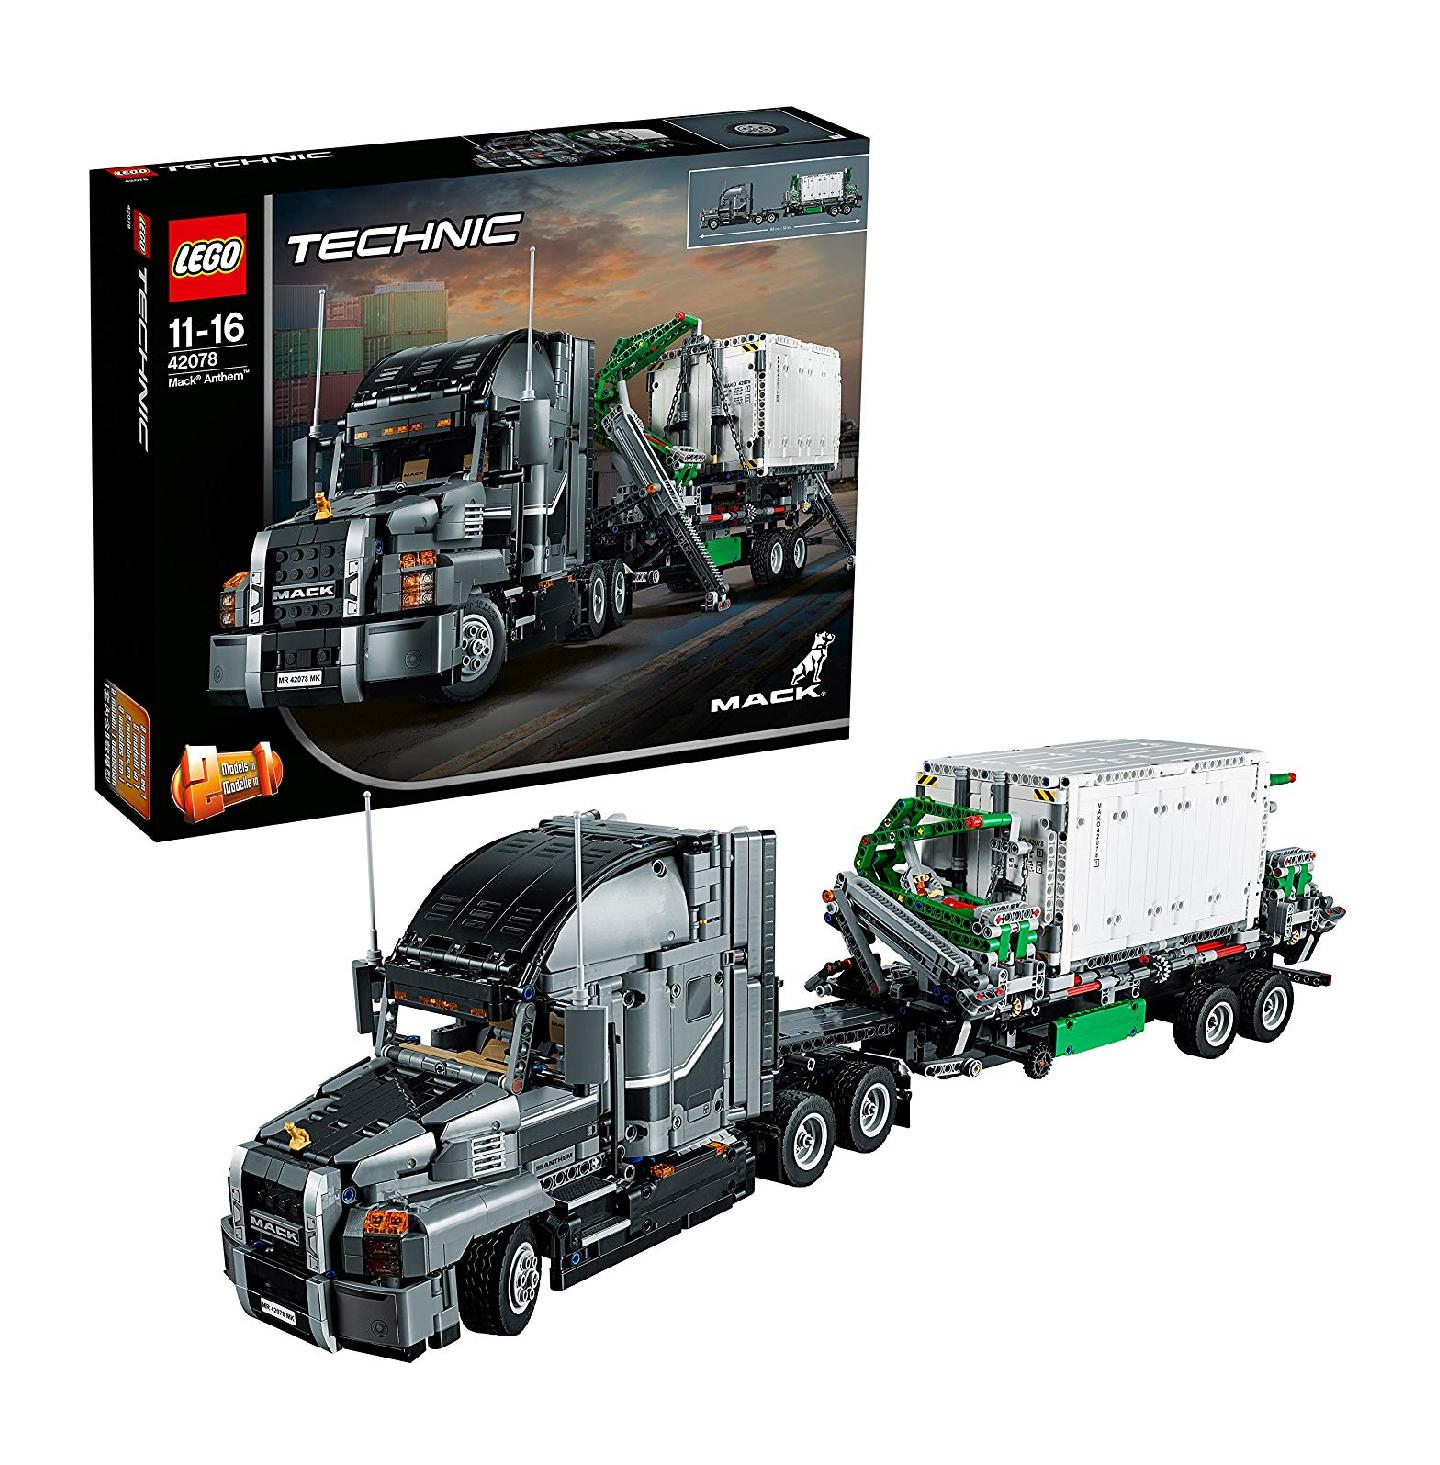 LEGO Technic 42078  - Amazon.de